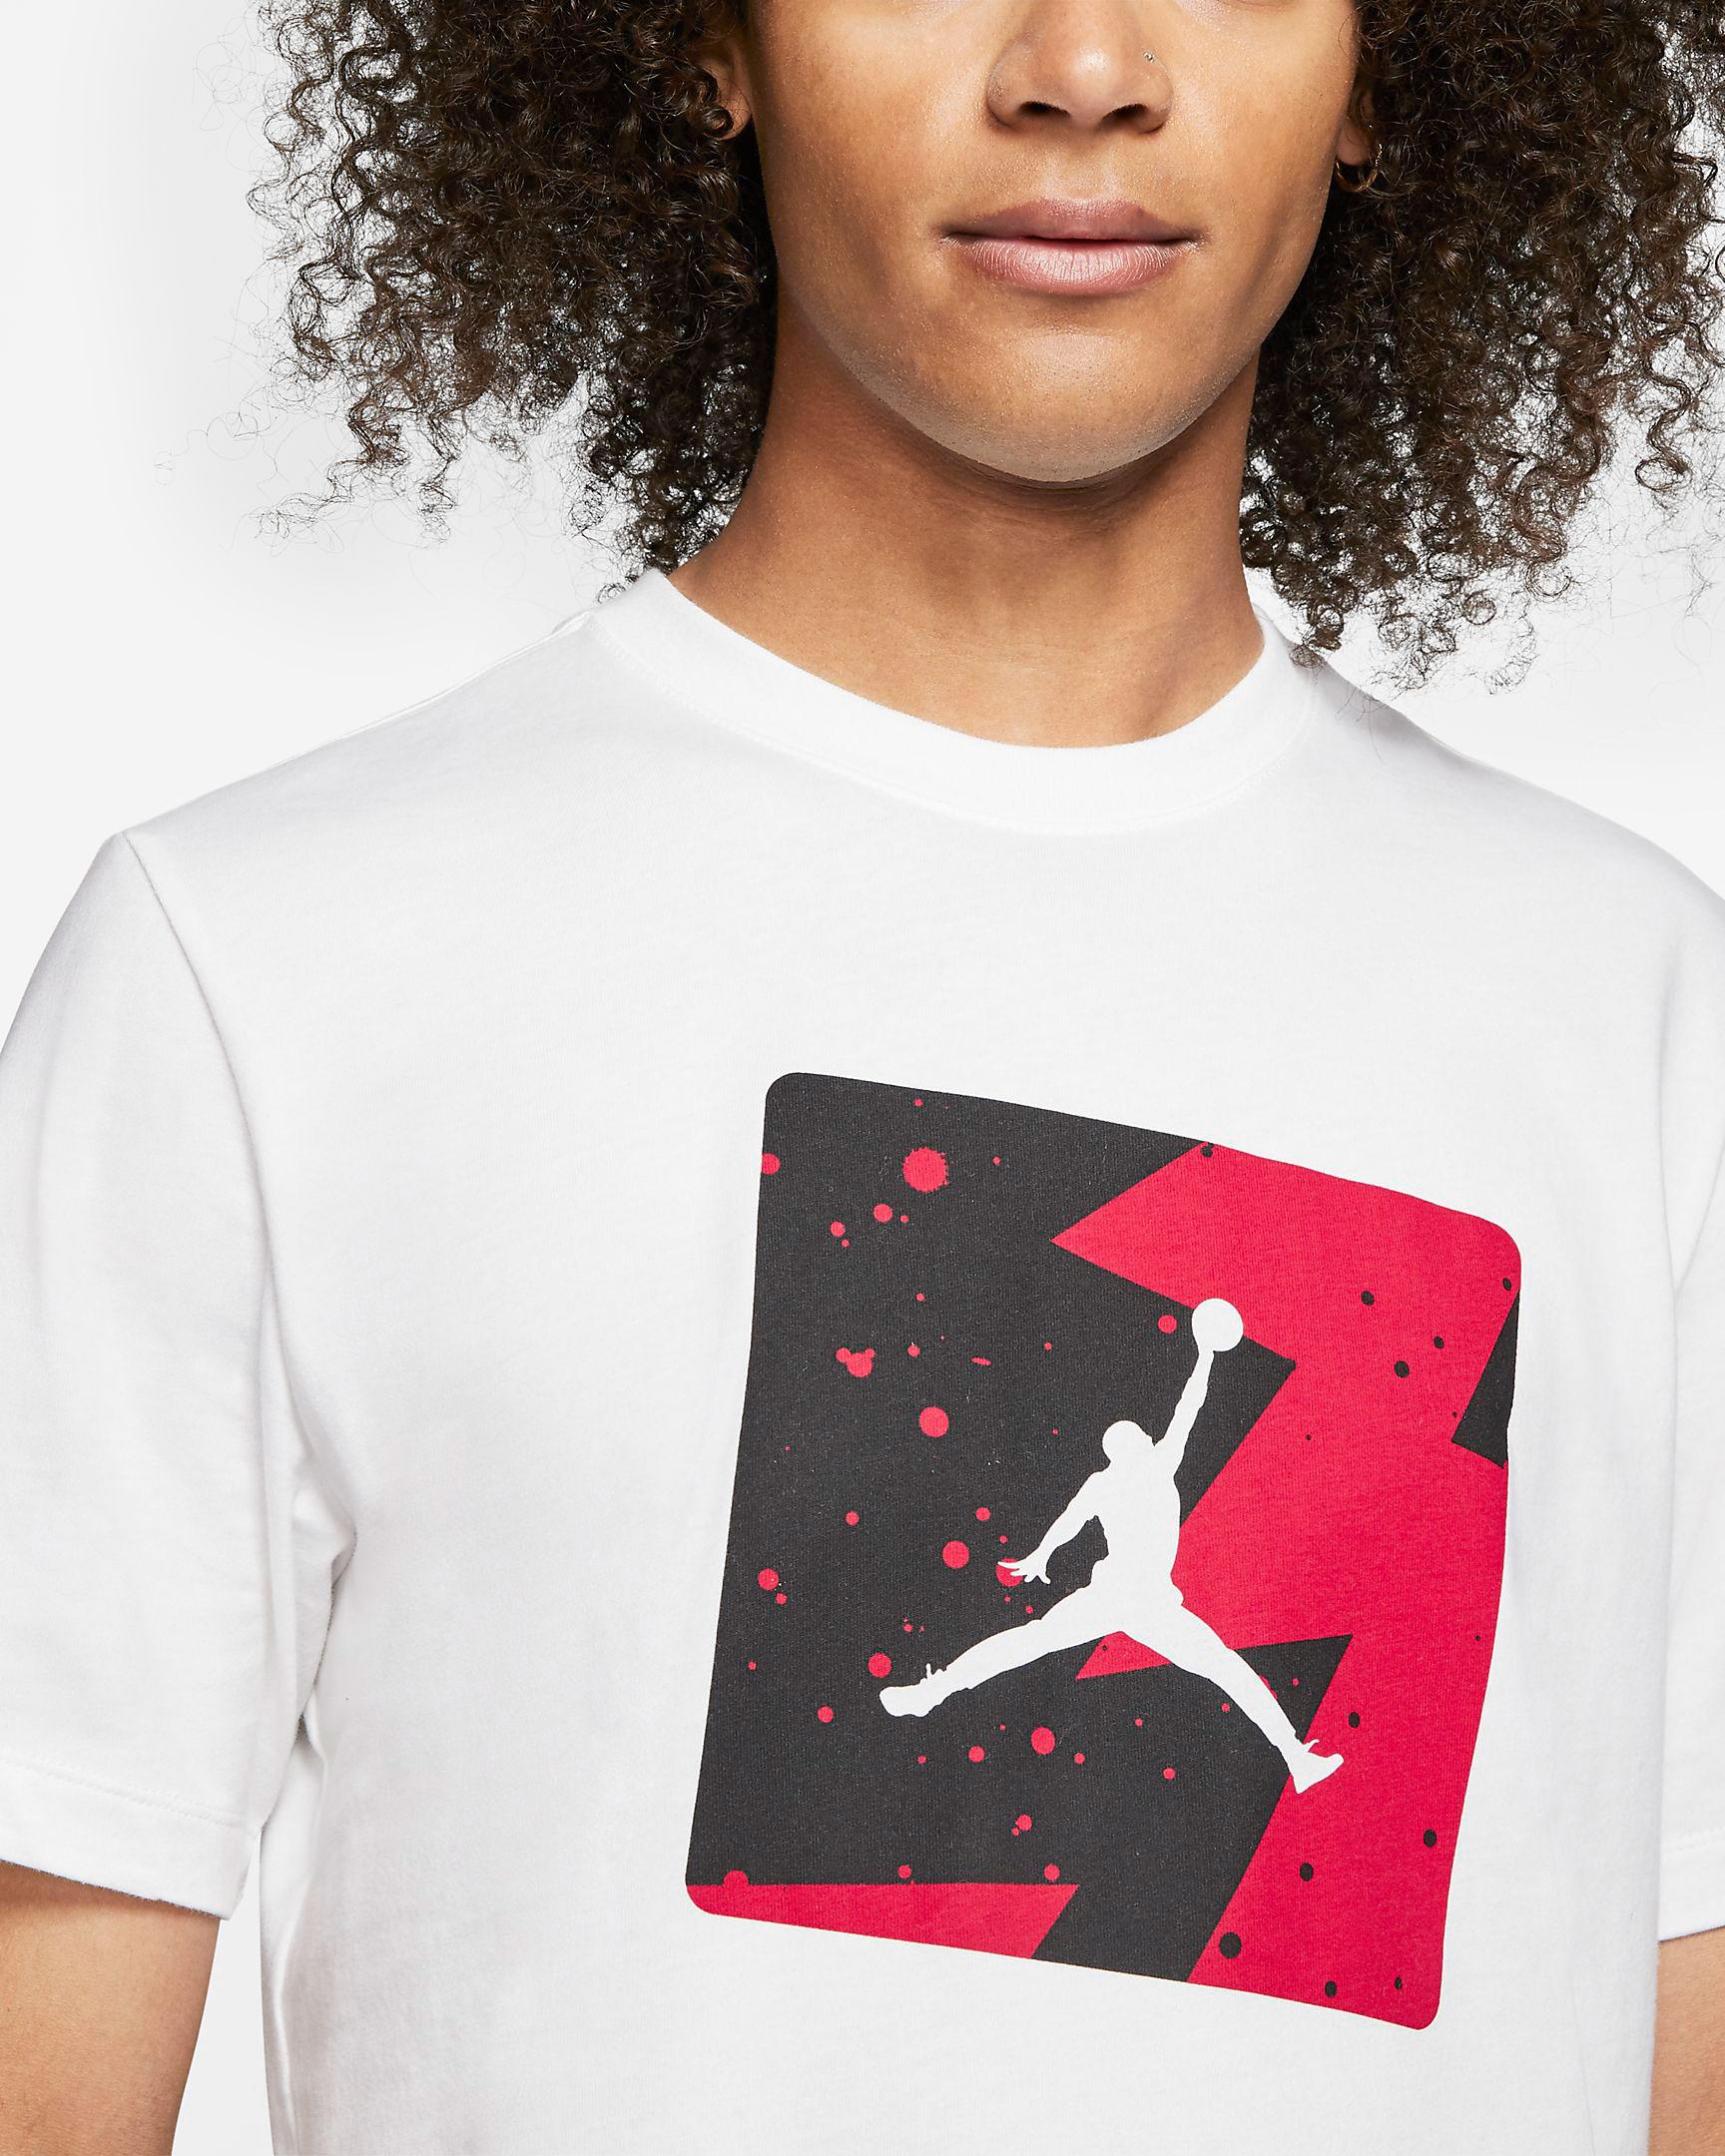 air-jordan-6-hare-matching-shirt-1